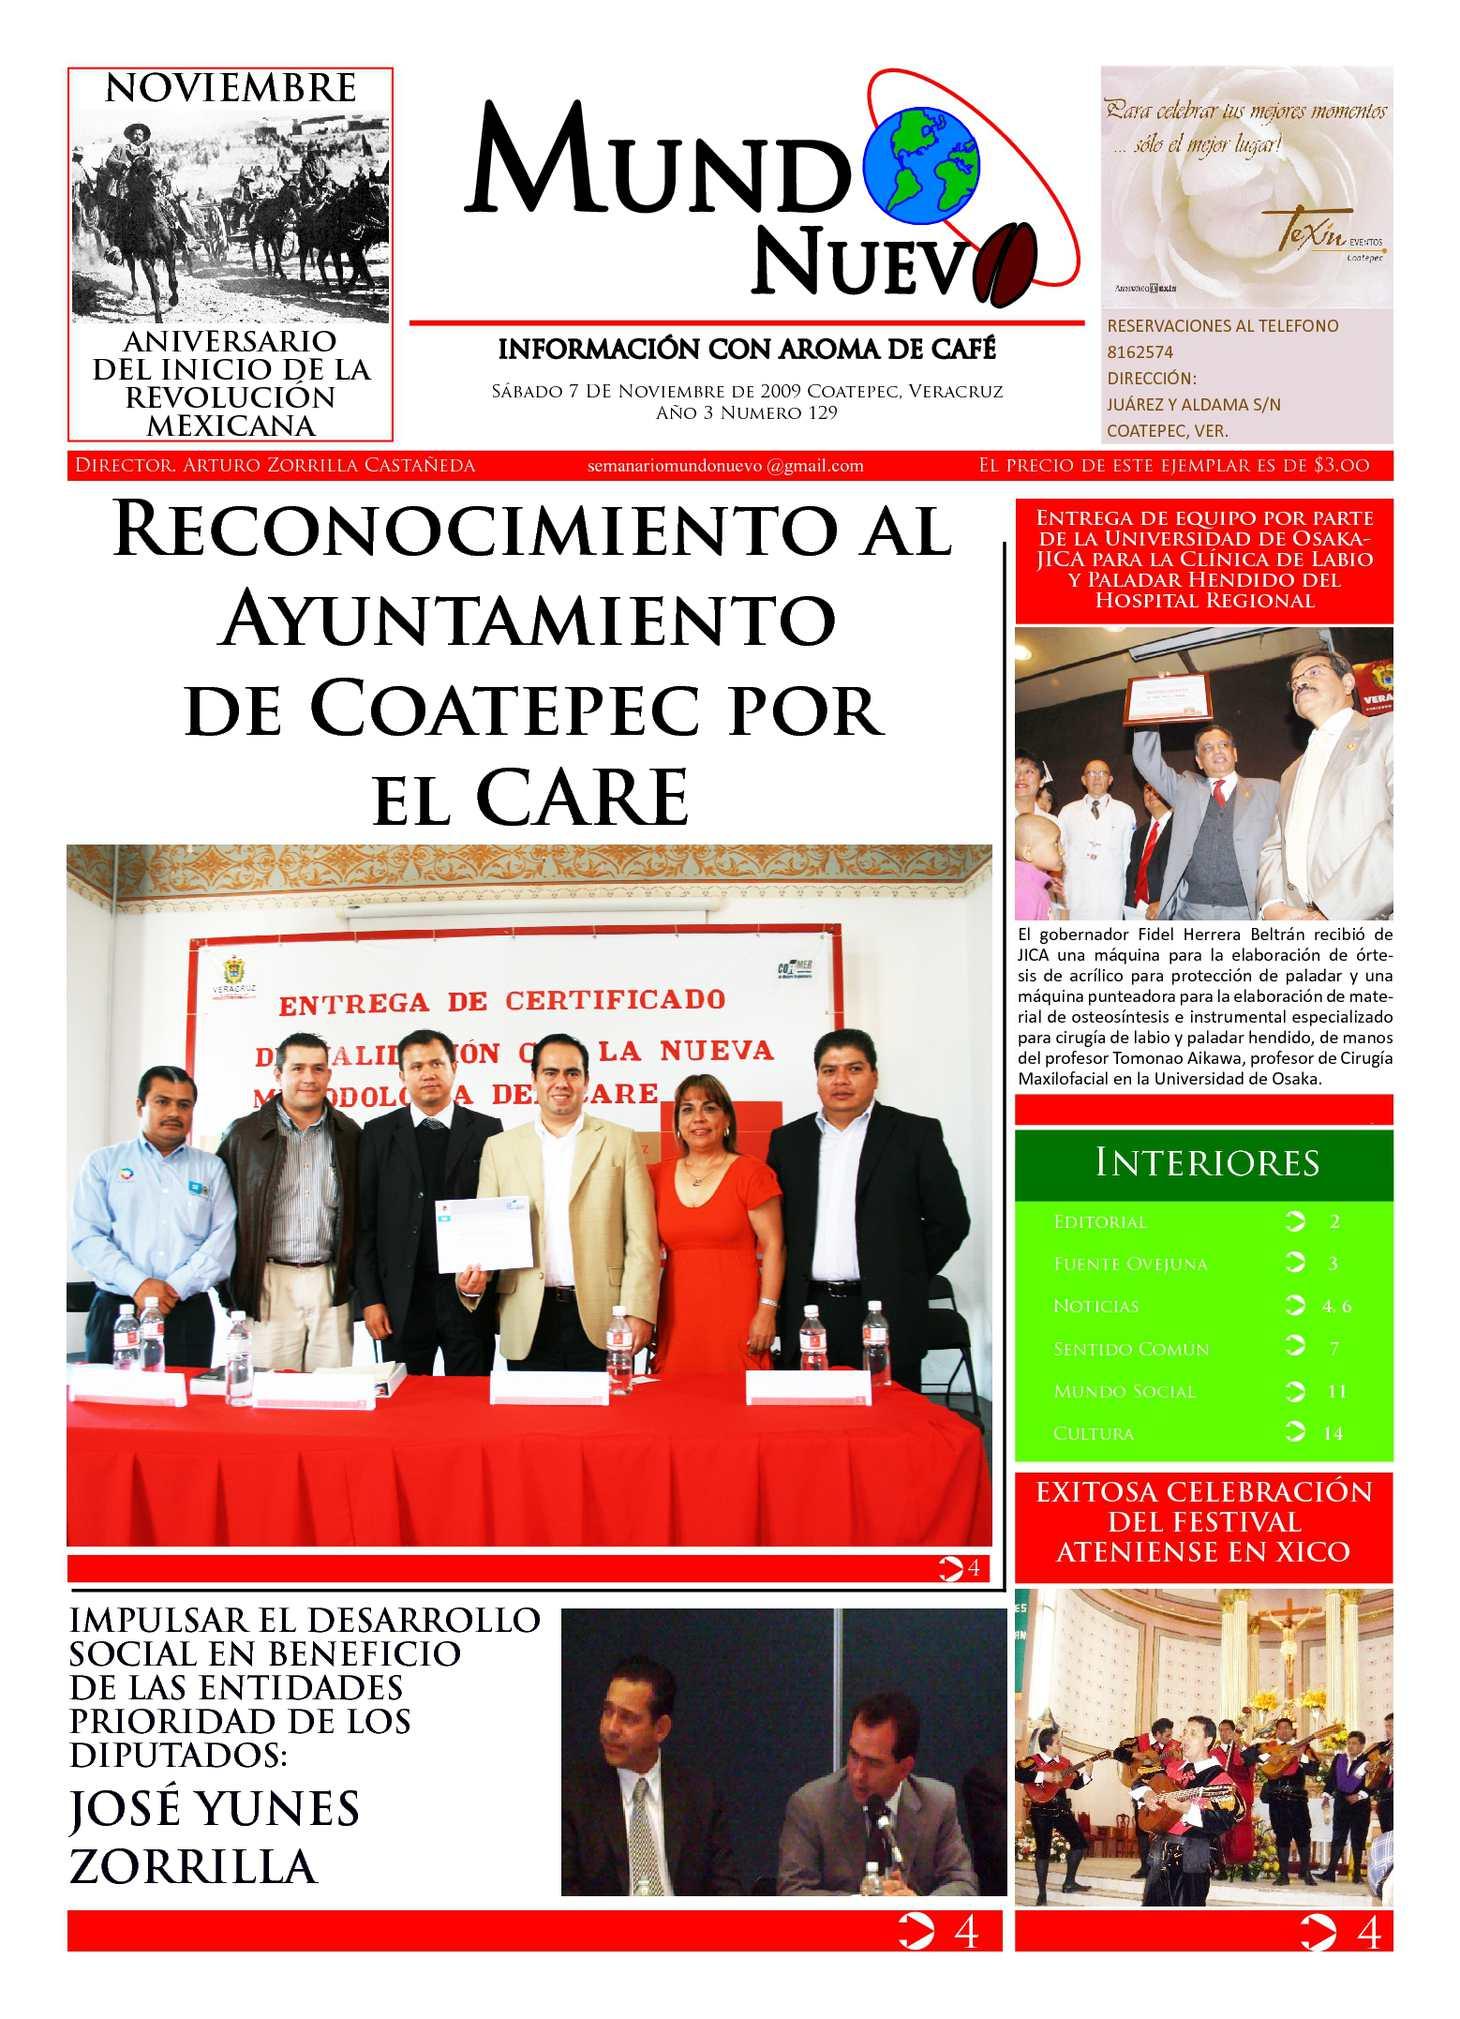 Calaméo - Semanario undo Nuevo. Información con aroma de café